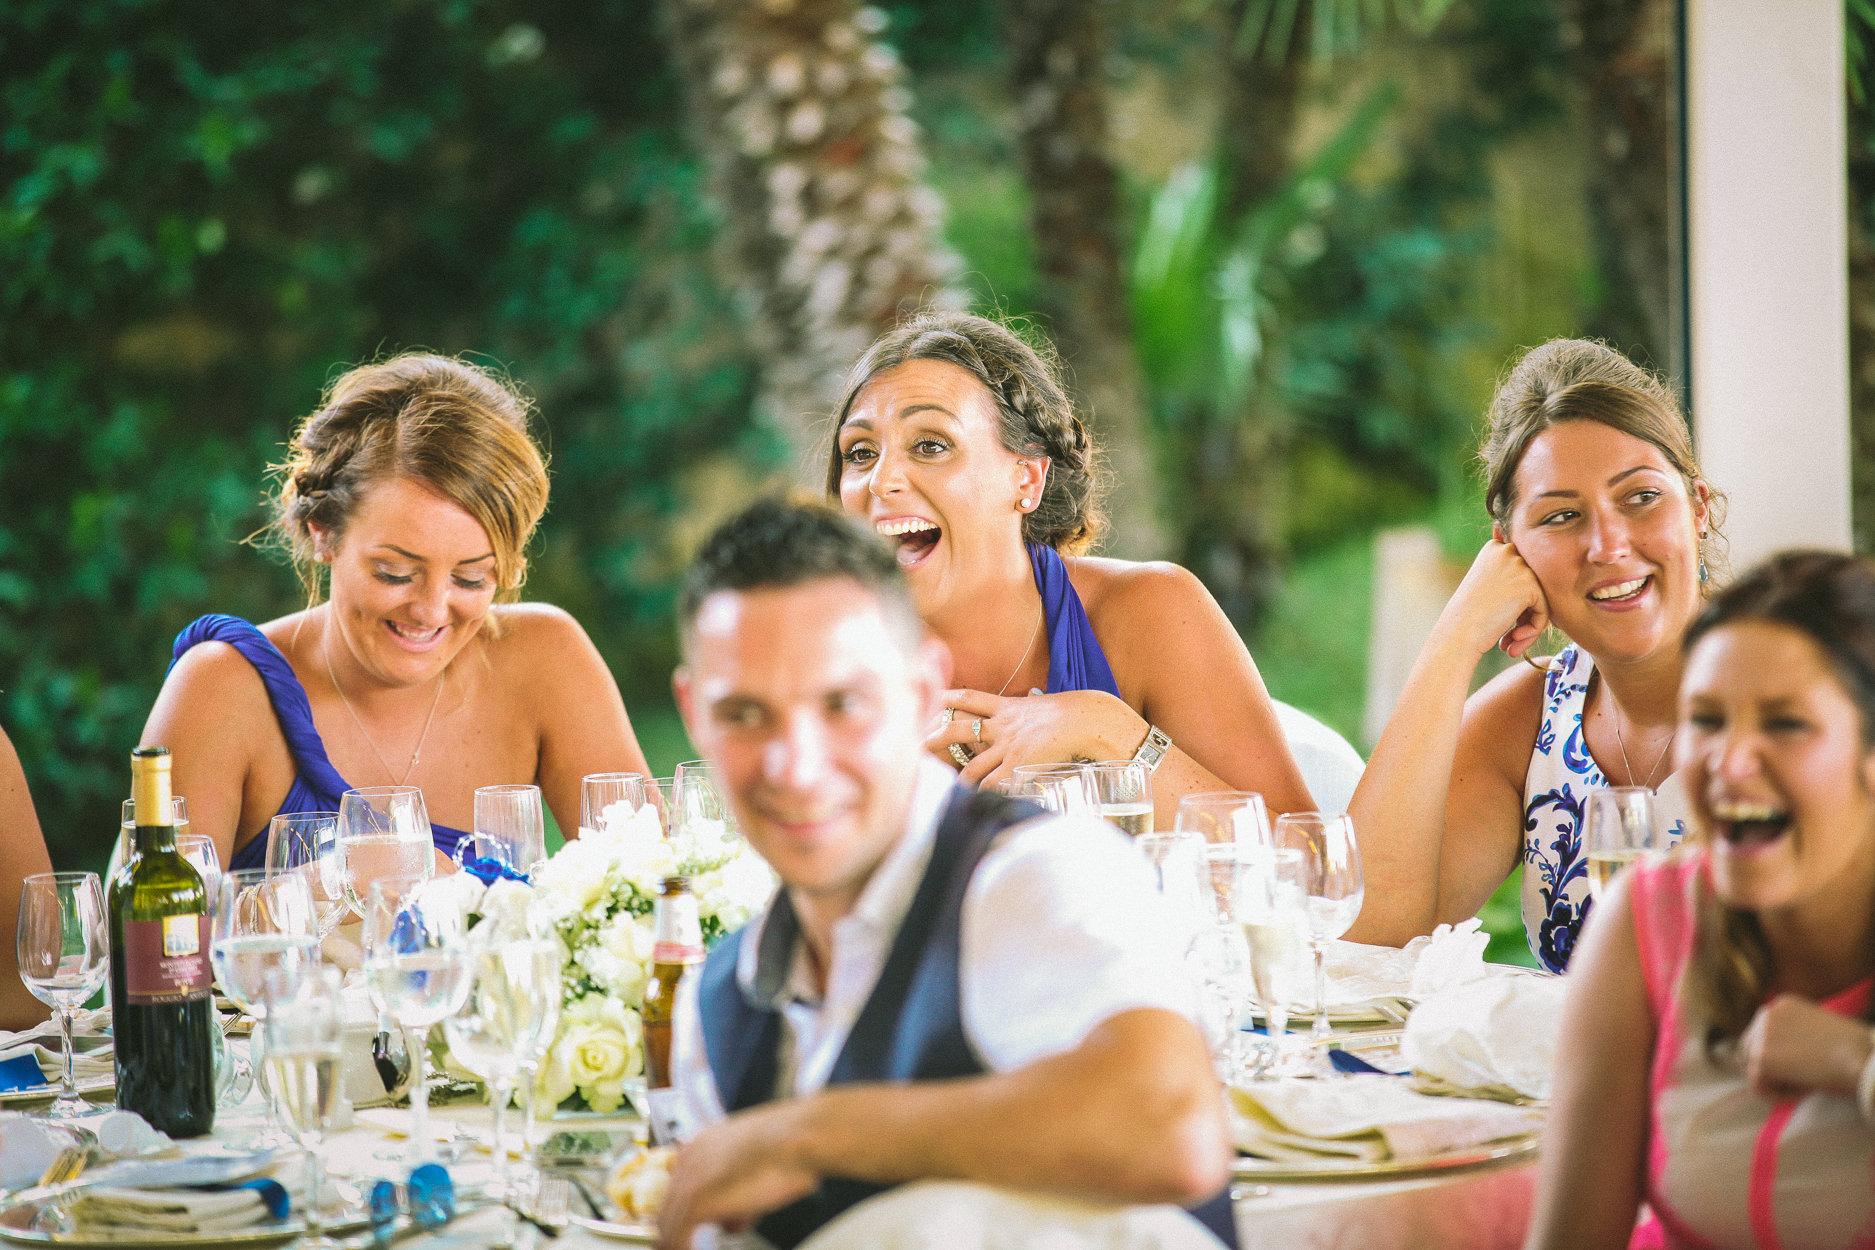 Amalfi-Coast-wedding-venue-Wedding-Photography-Villa Antiche Mura-Sorrento-Italy-22